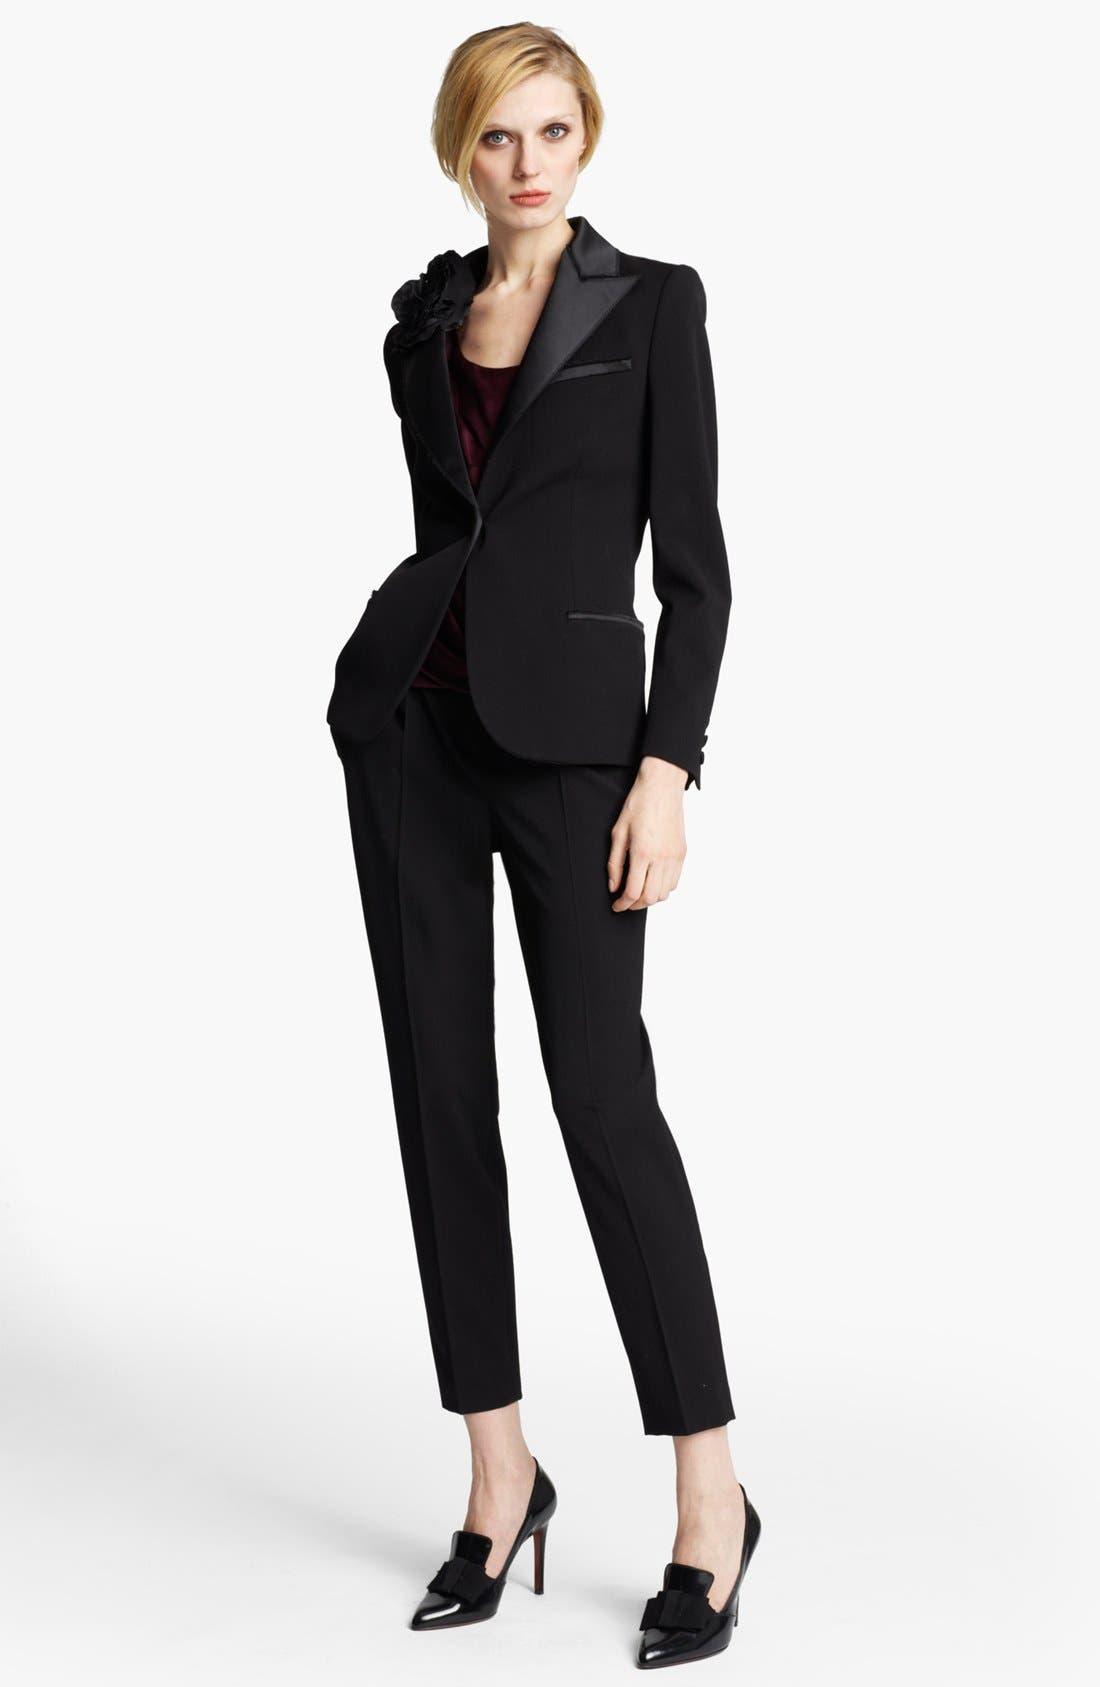 Main Image - Lanvin Satin Lapel Tuxedo Jacket